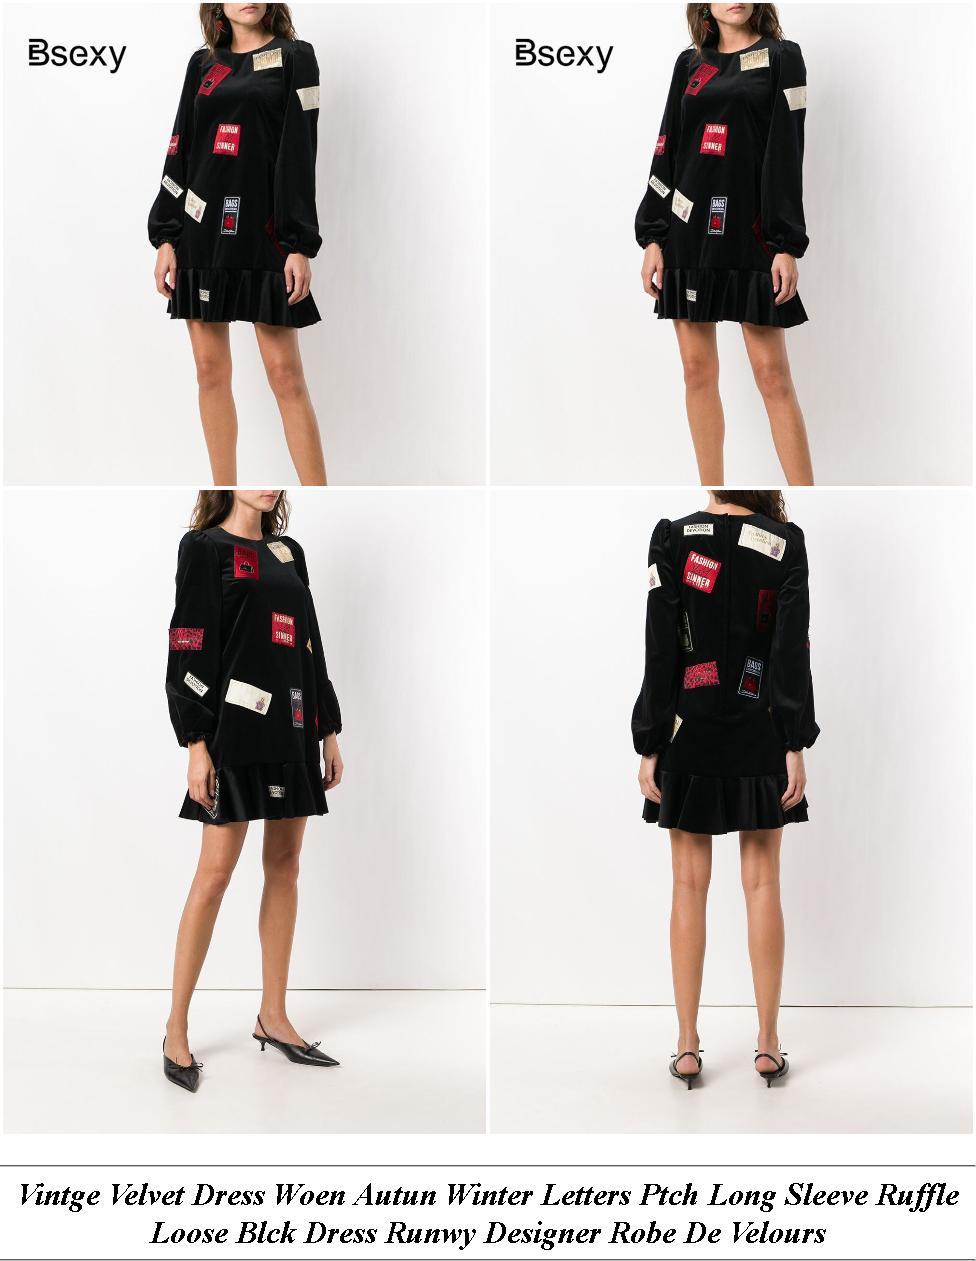 Fashion Dresser Jo Description - Sale Nike Usa - Lue And White Polka Dot Dress Royal Wedding